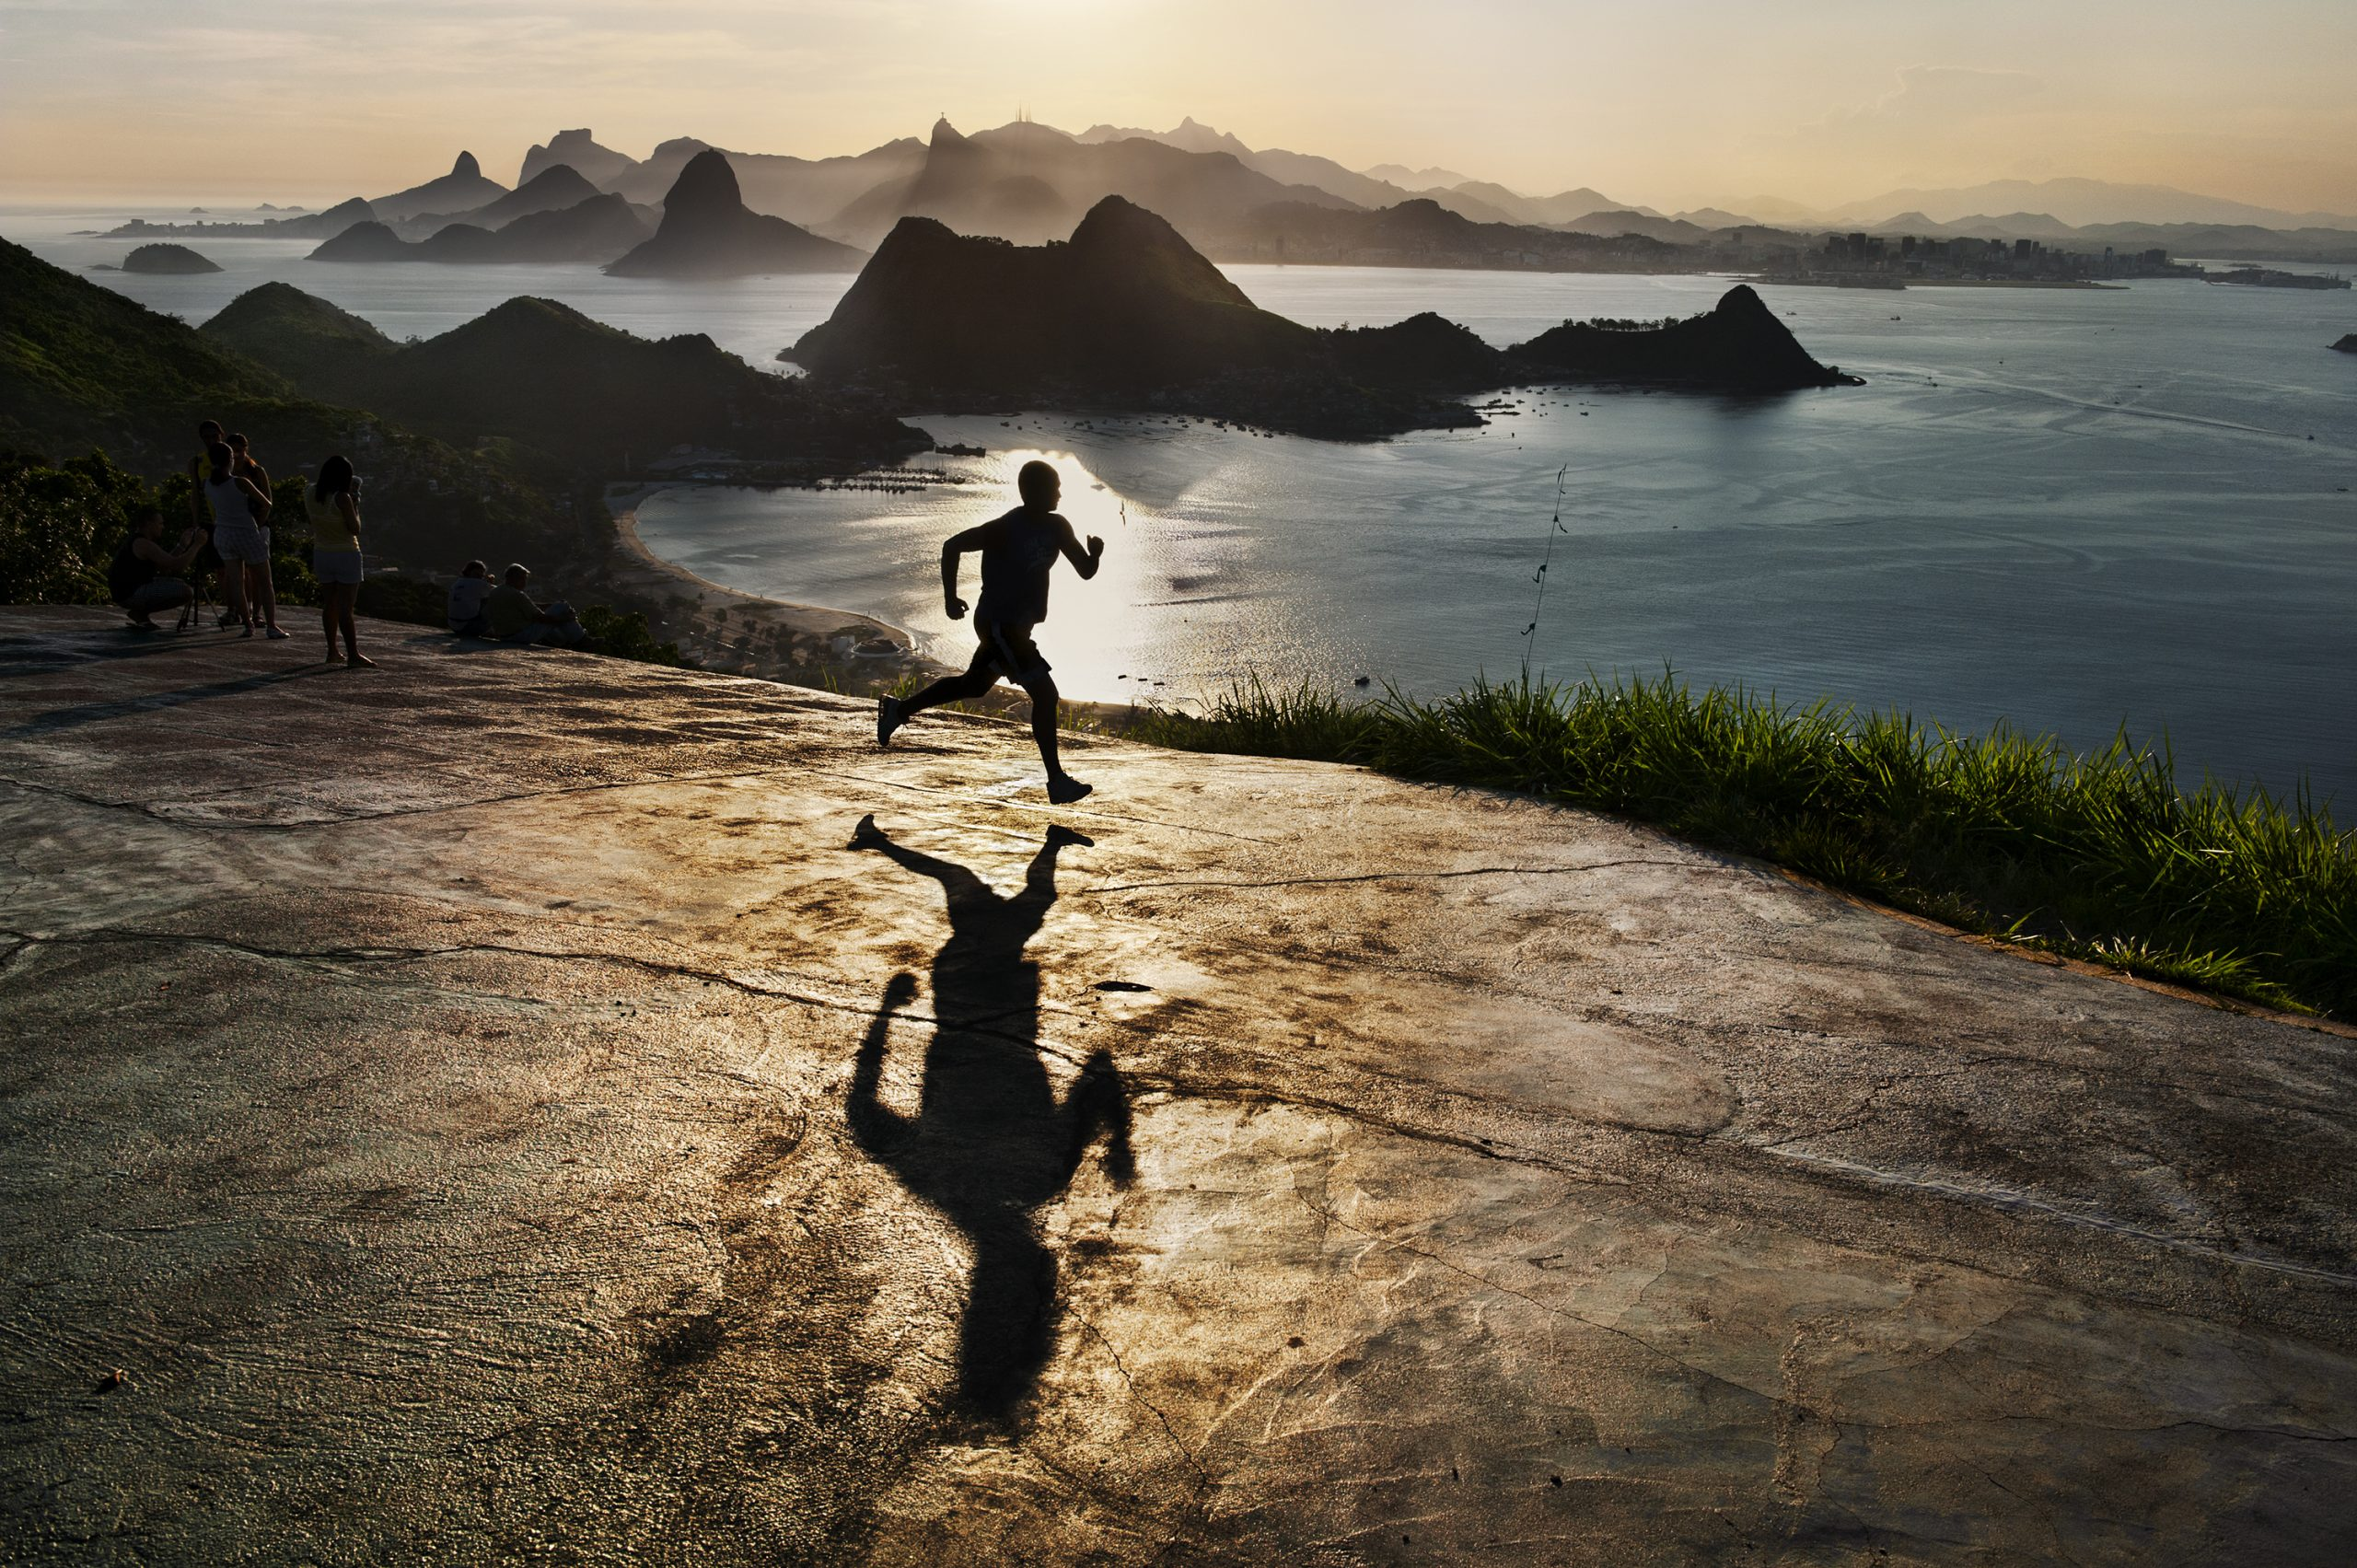 Steve McCurry巴西里约热内卢,黎明时分奔跑的人。